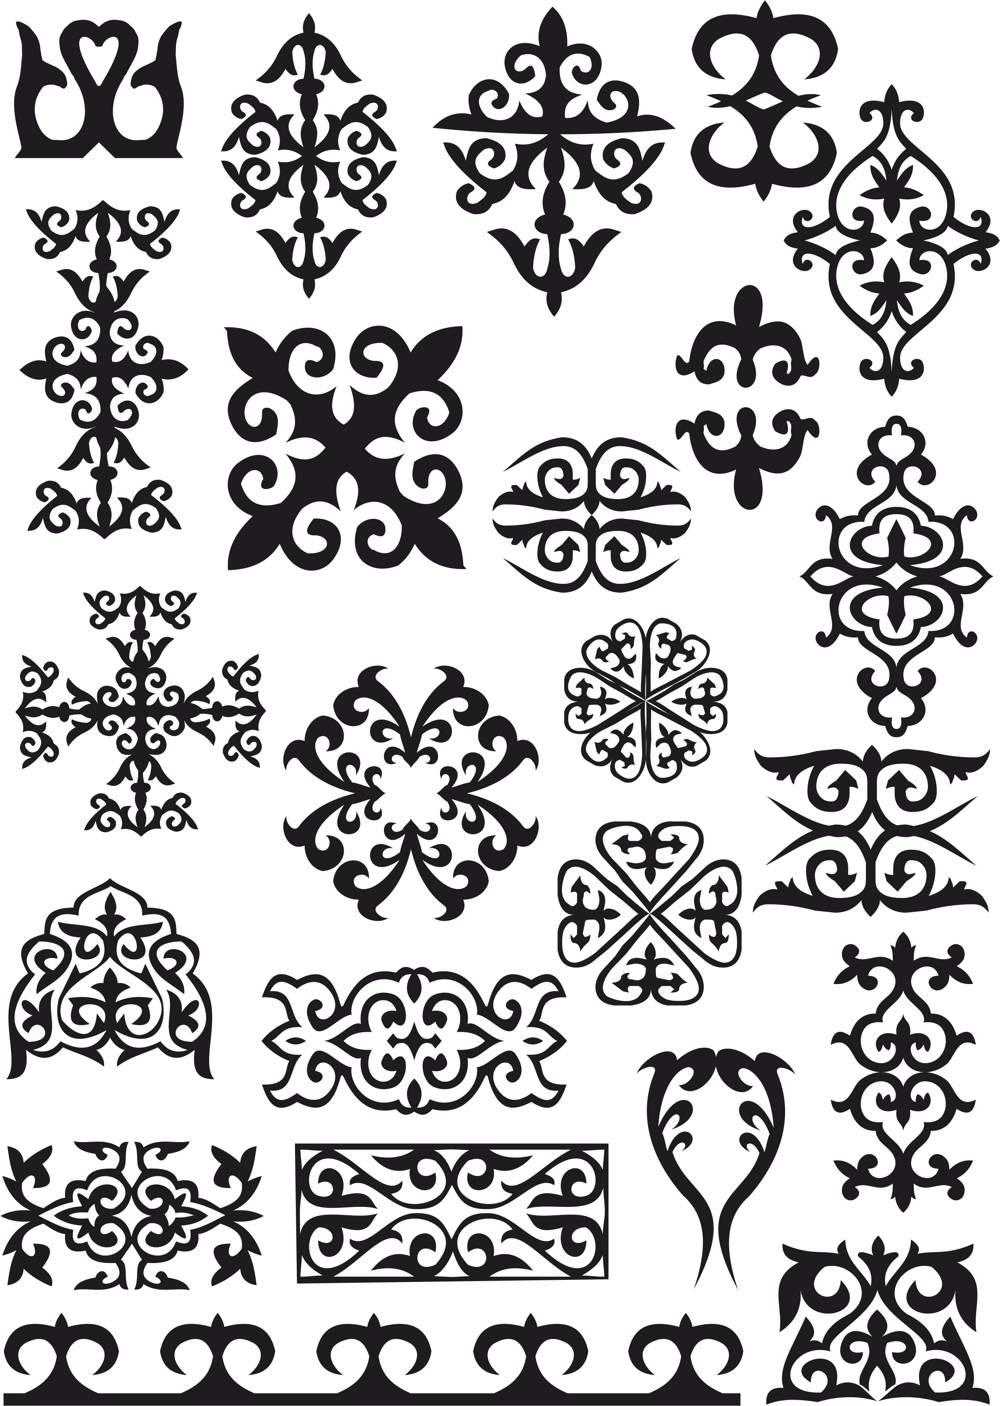 Kazakh Ornaments Patterns File Free CDR Vectors Art